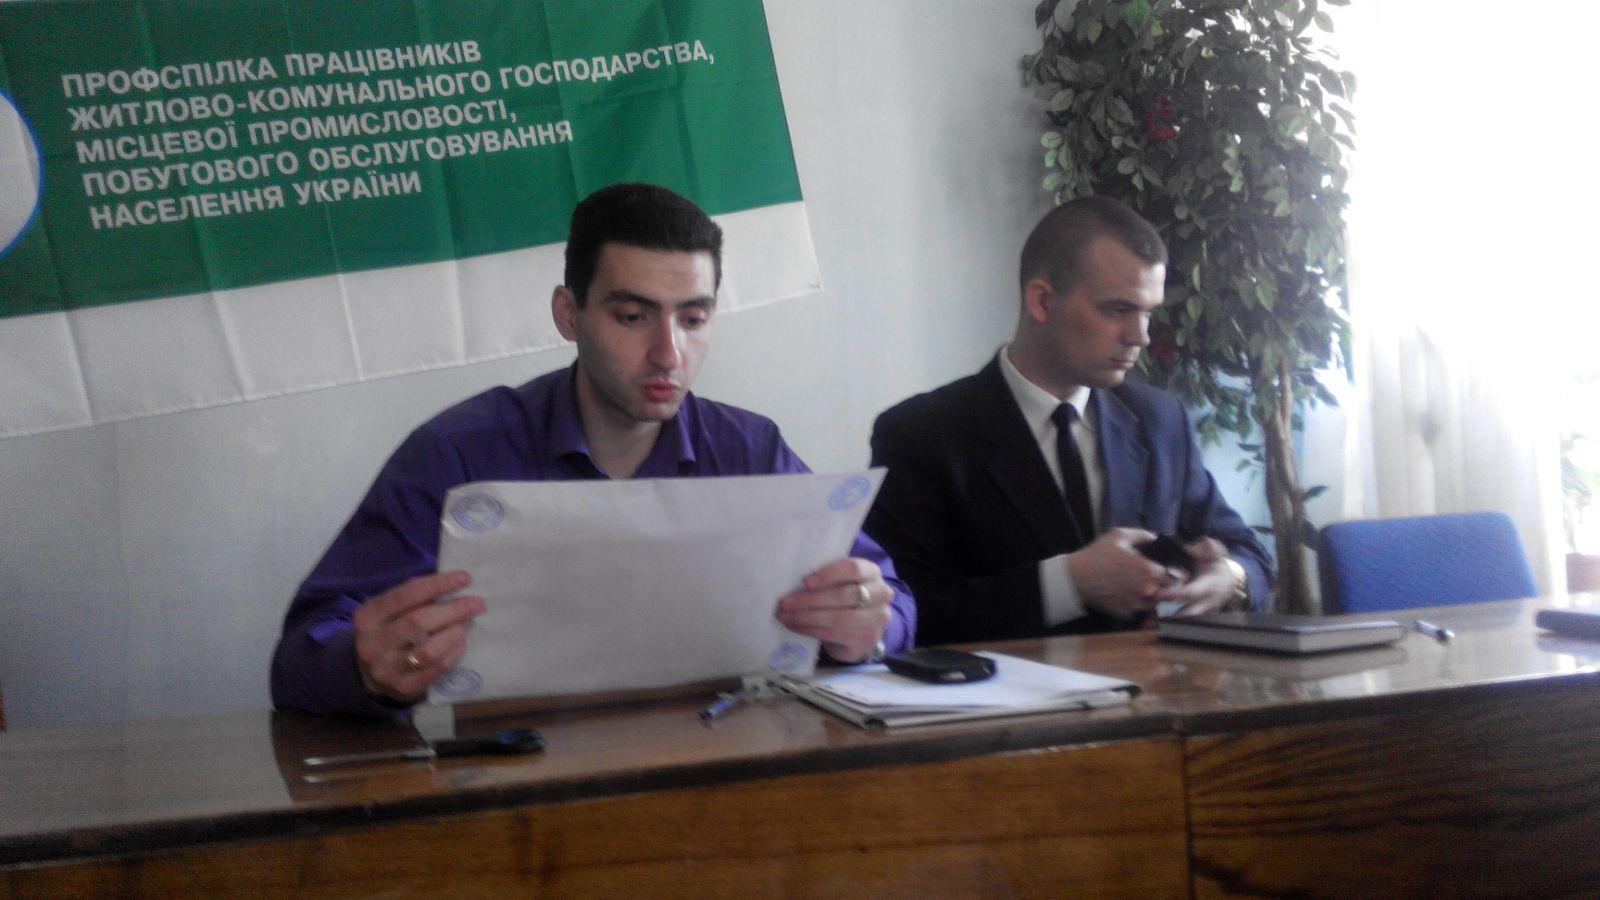 ЖКГ Миколаїв